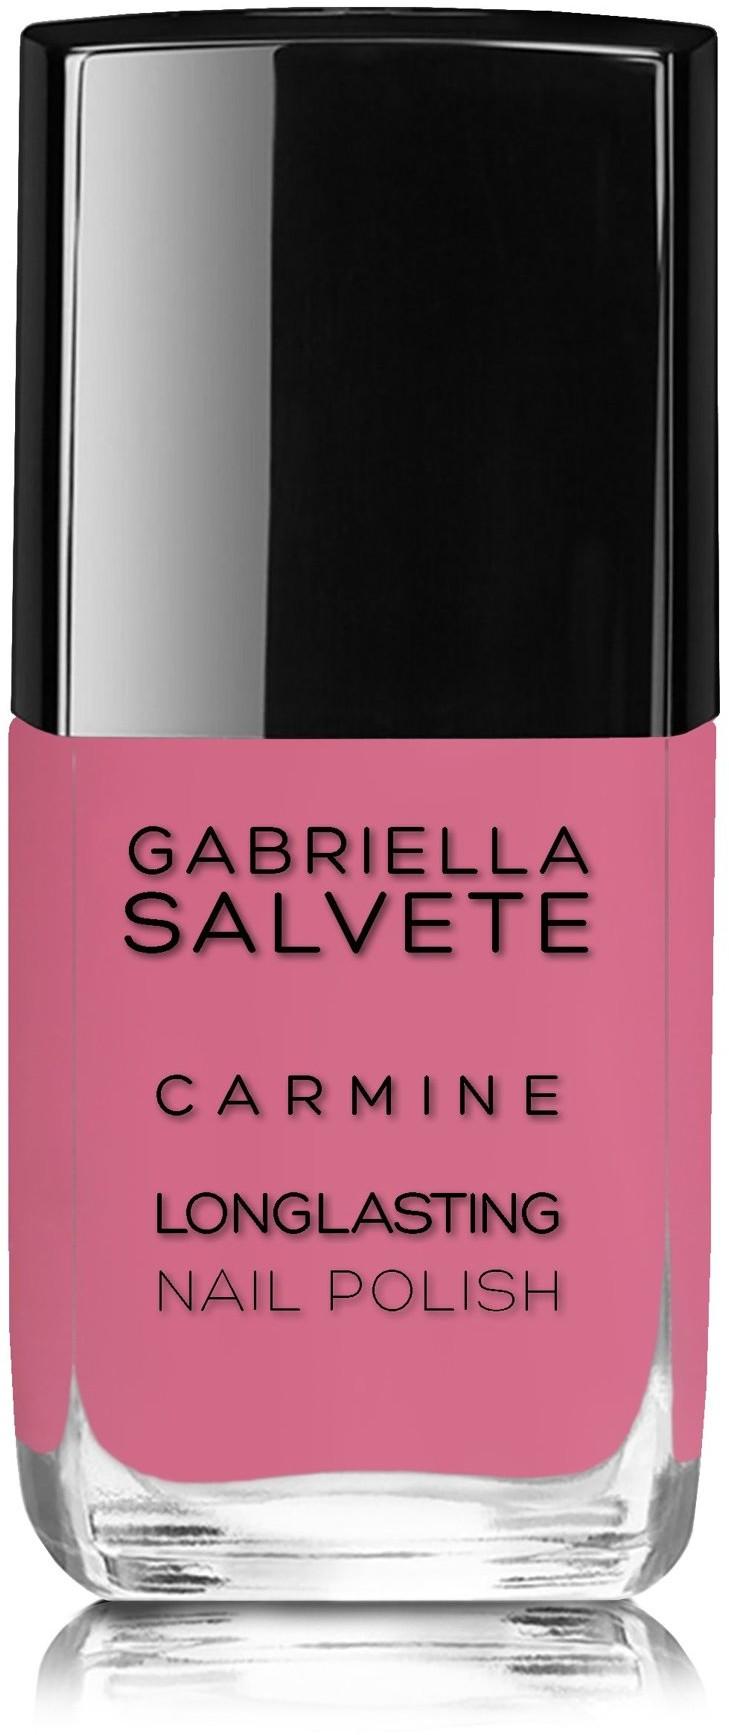 Gabriella Salvete Longlasting Enamel 11ml Lakier do paznokci 53 Carmine